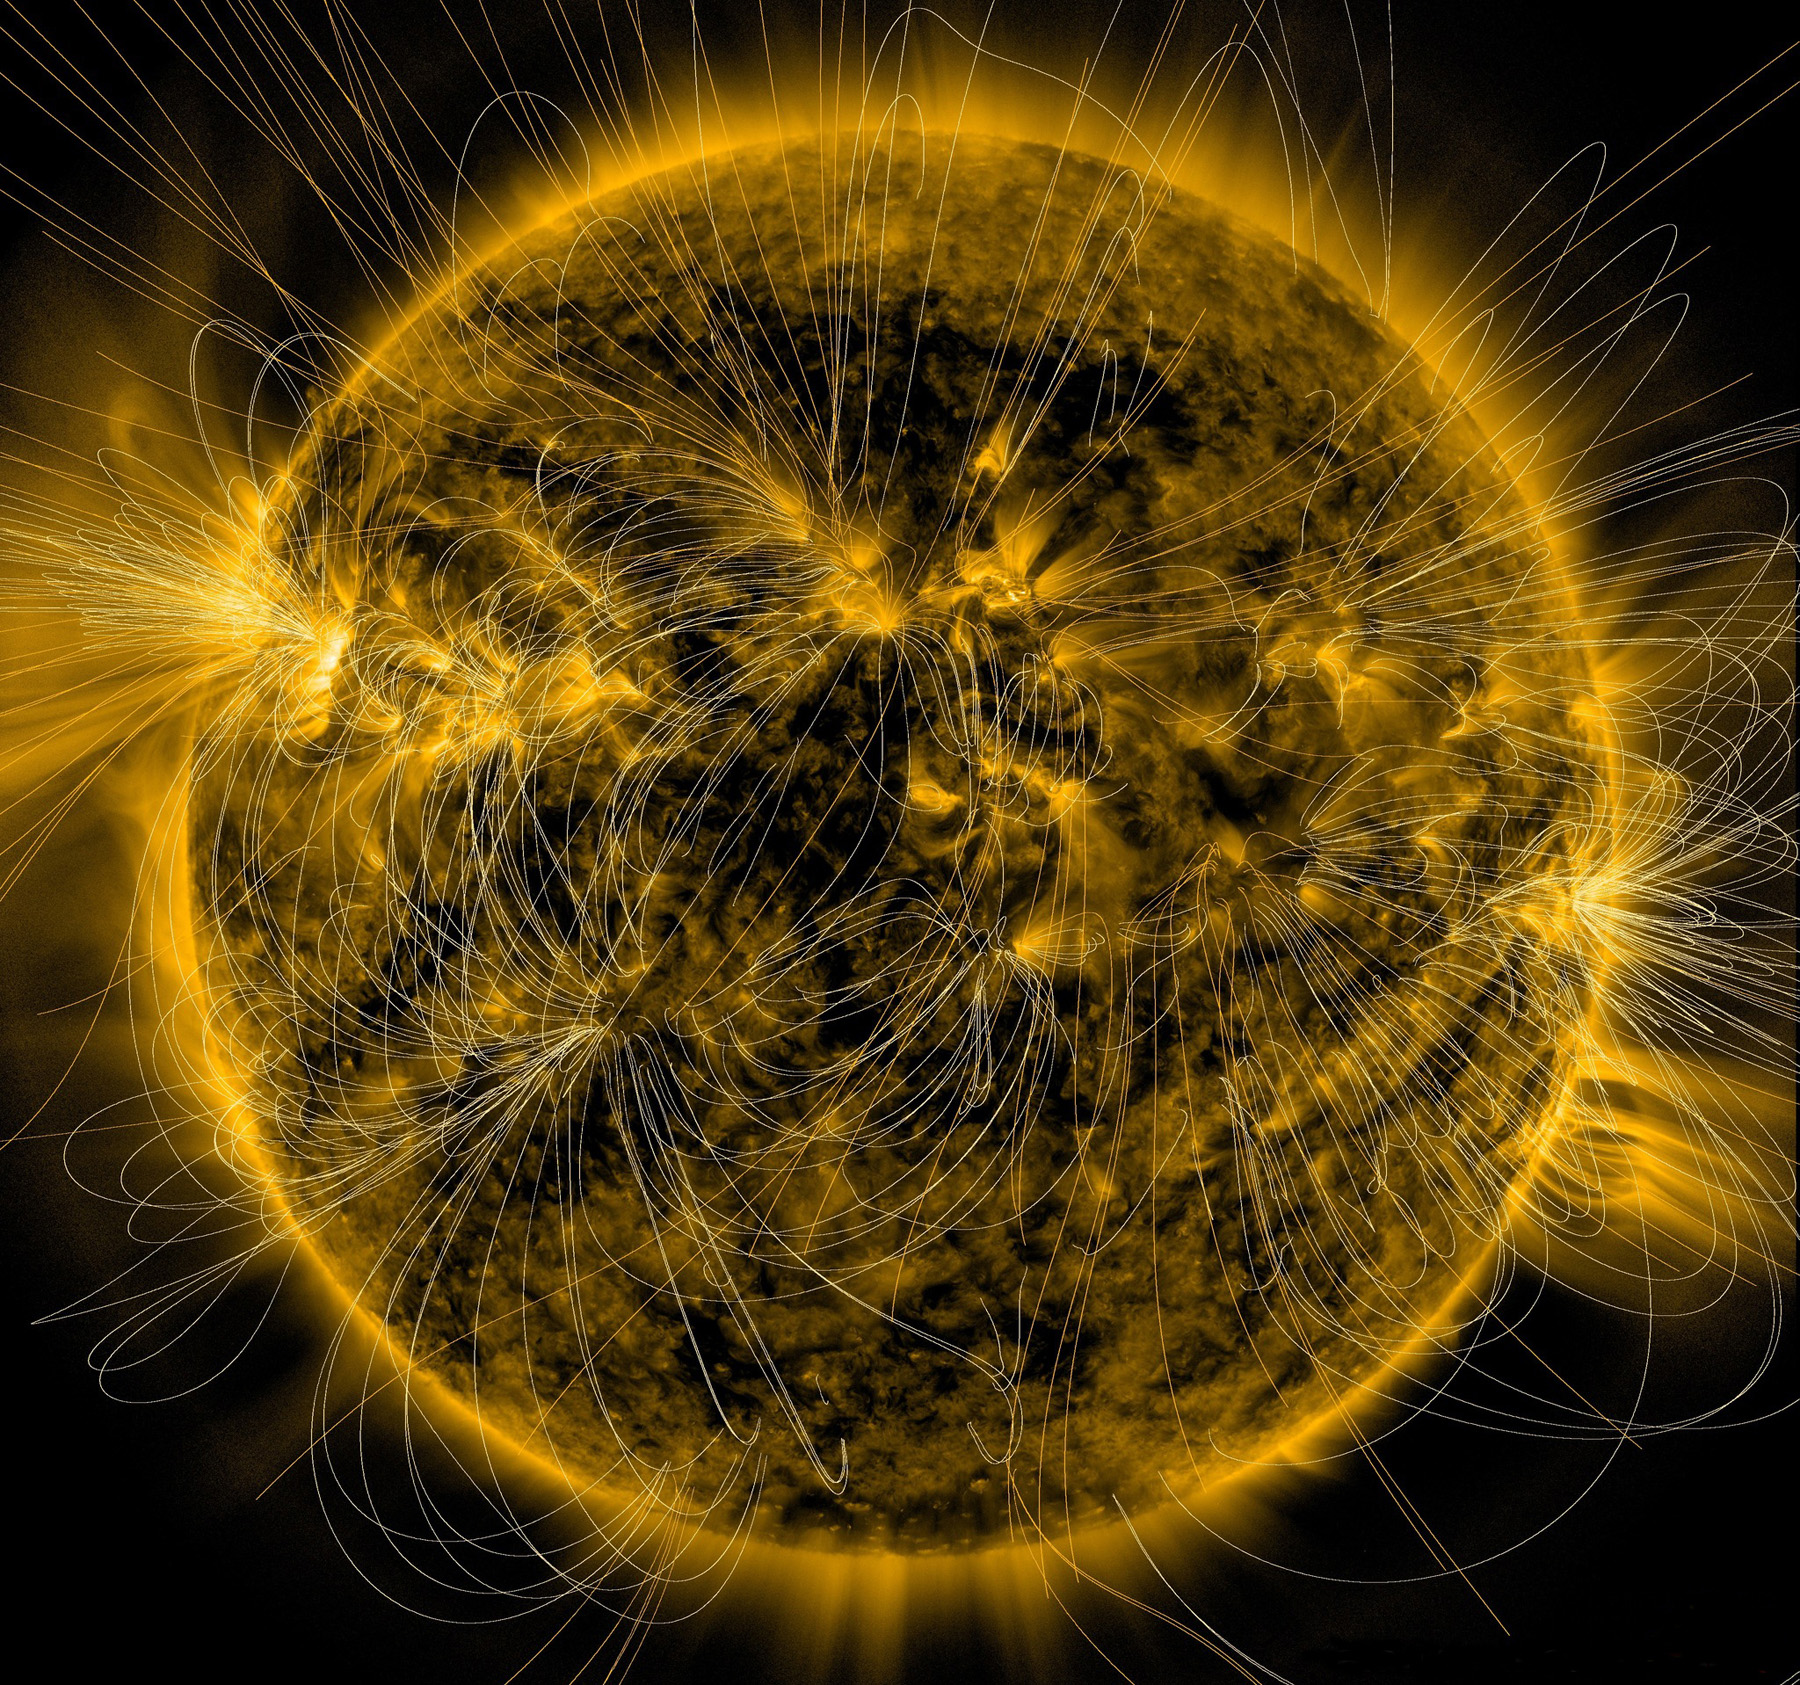 Солнце с магнитными полями